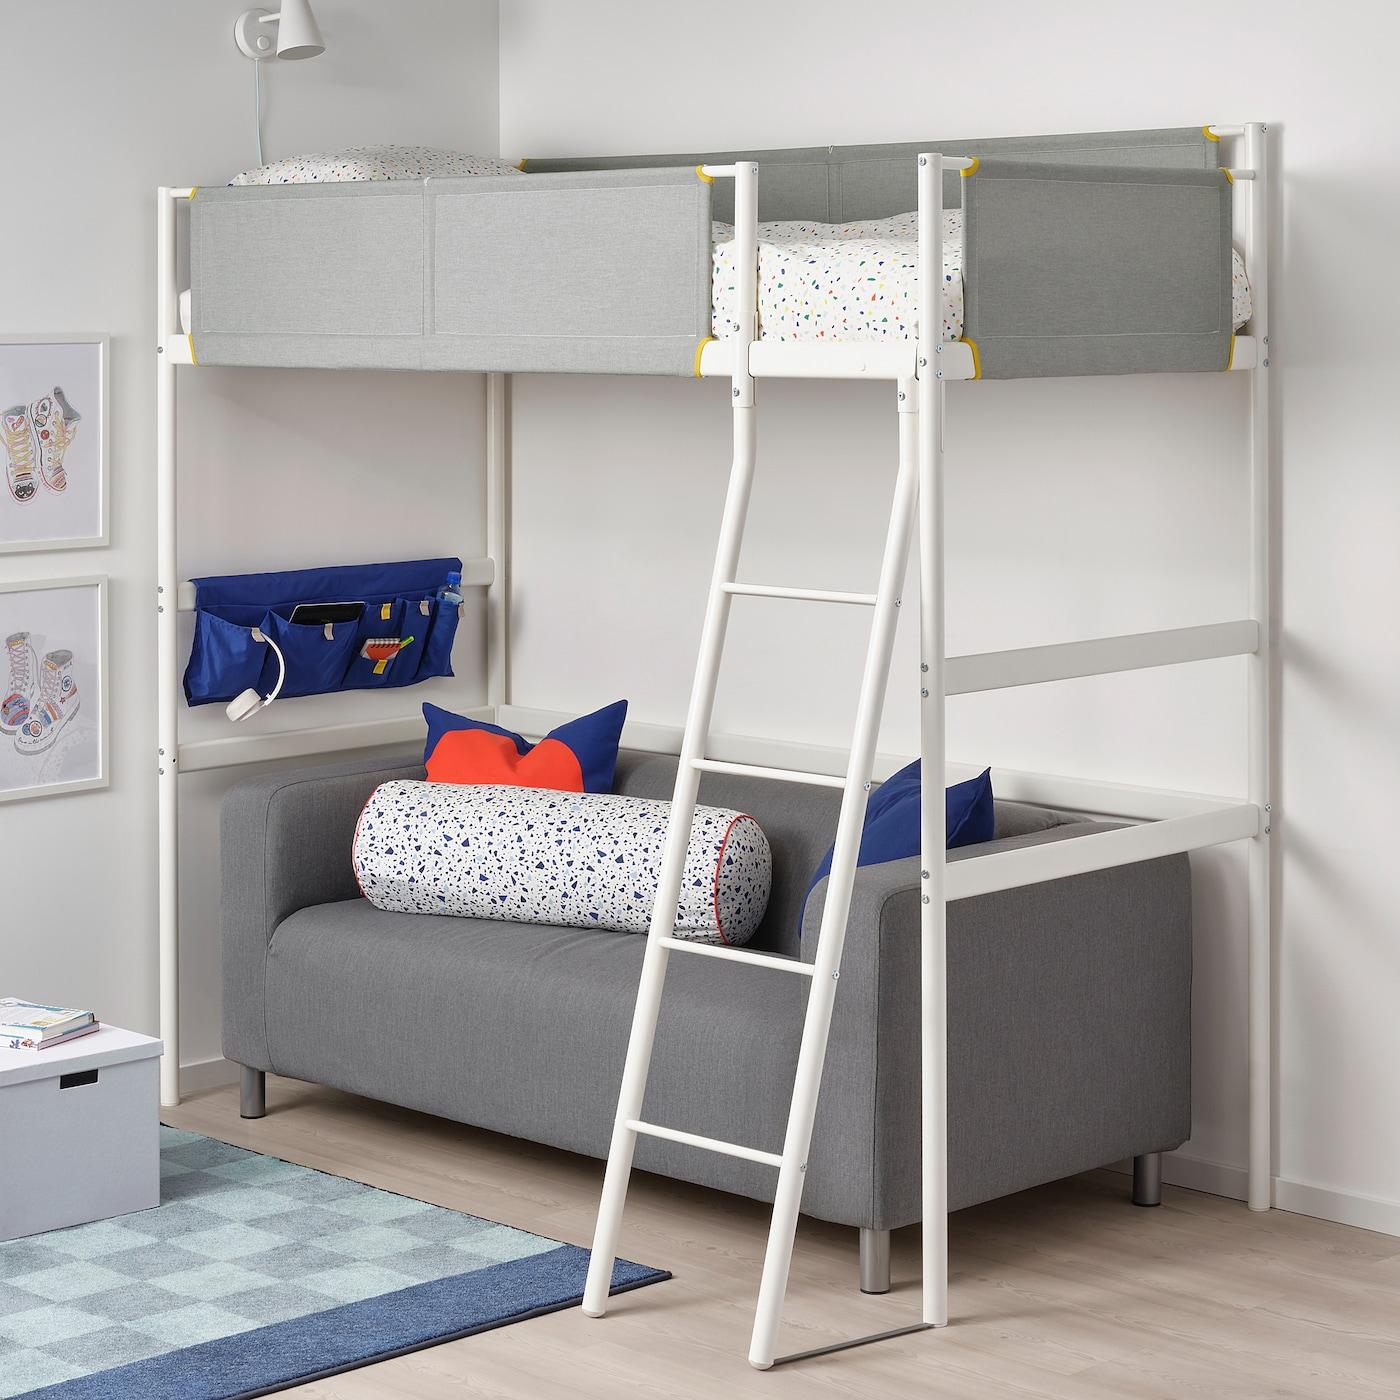 VITVAL Okvir izdignutog kreveta, bela/svetlosiva, 90x200 cm